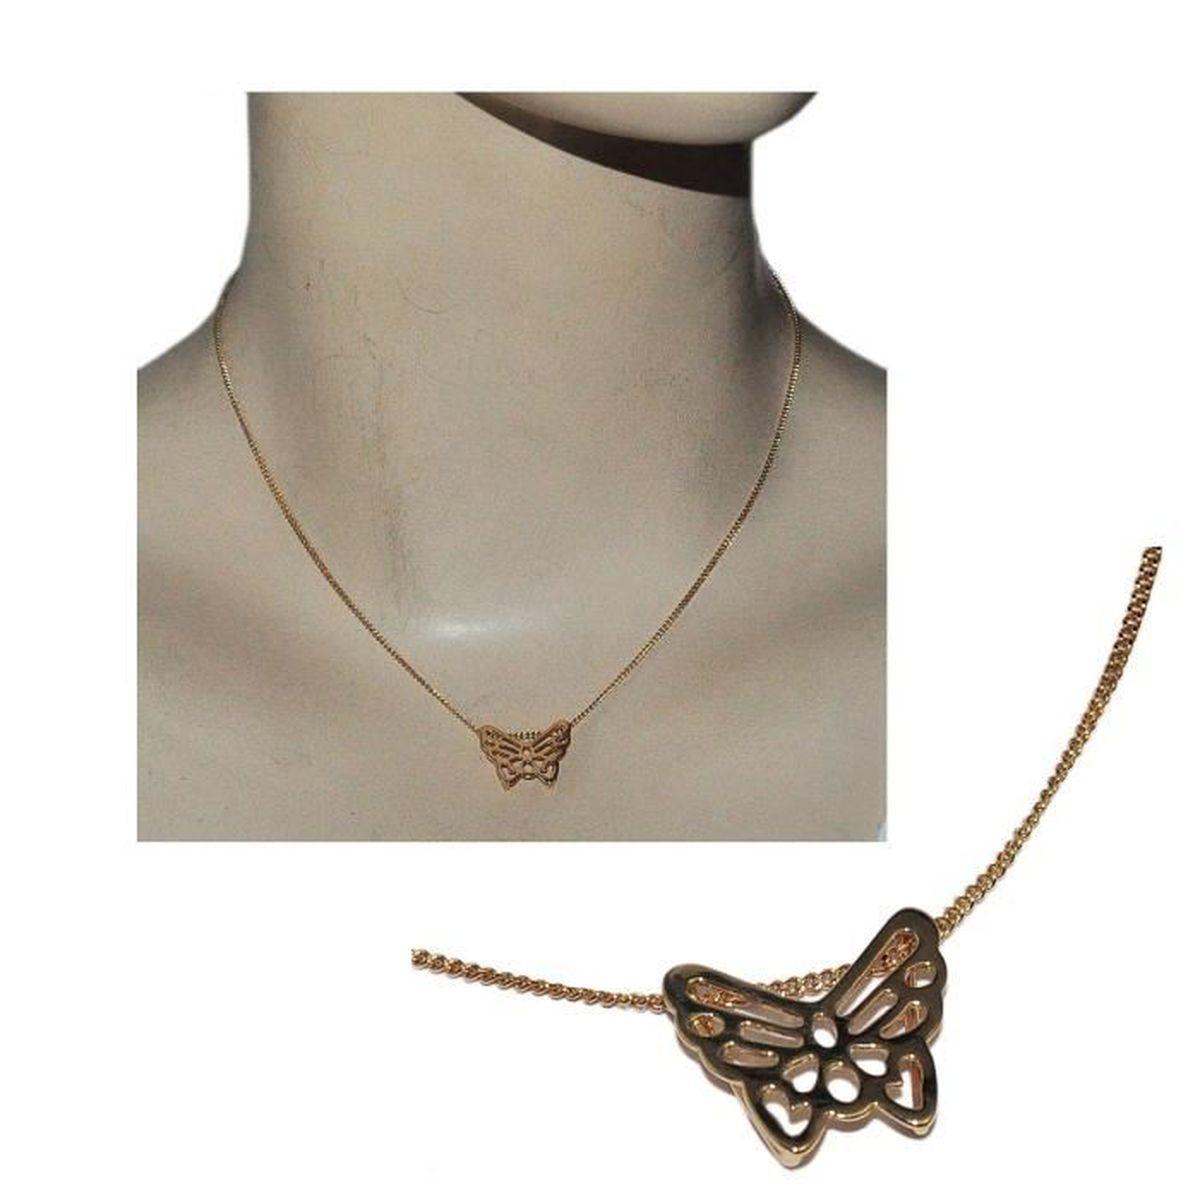 "Femme Fleur Collier Pendentif 18k or jaune REMPLI 18/"" Chaîne Fashion Jewelry"